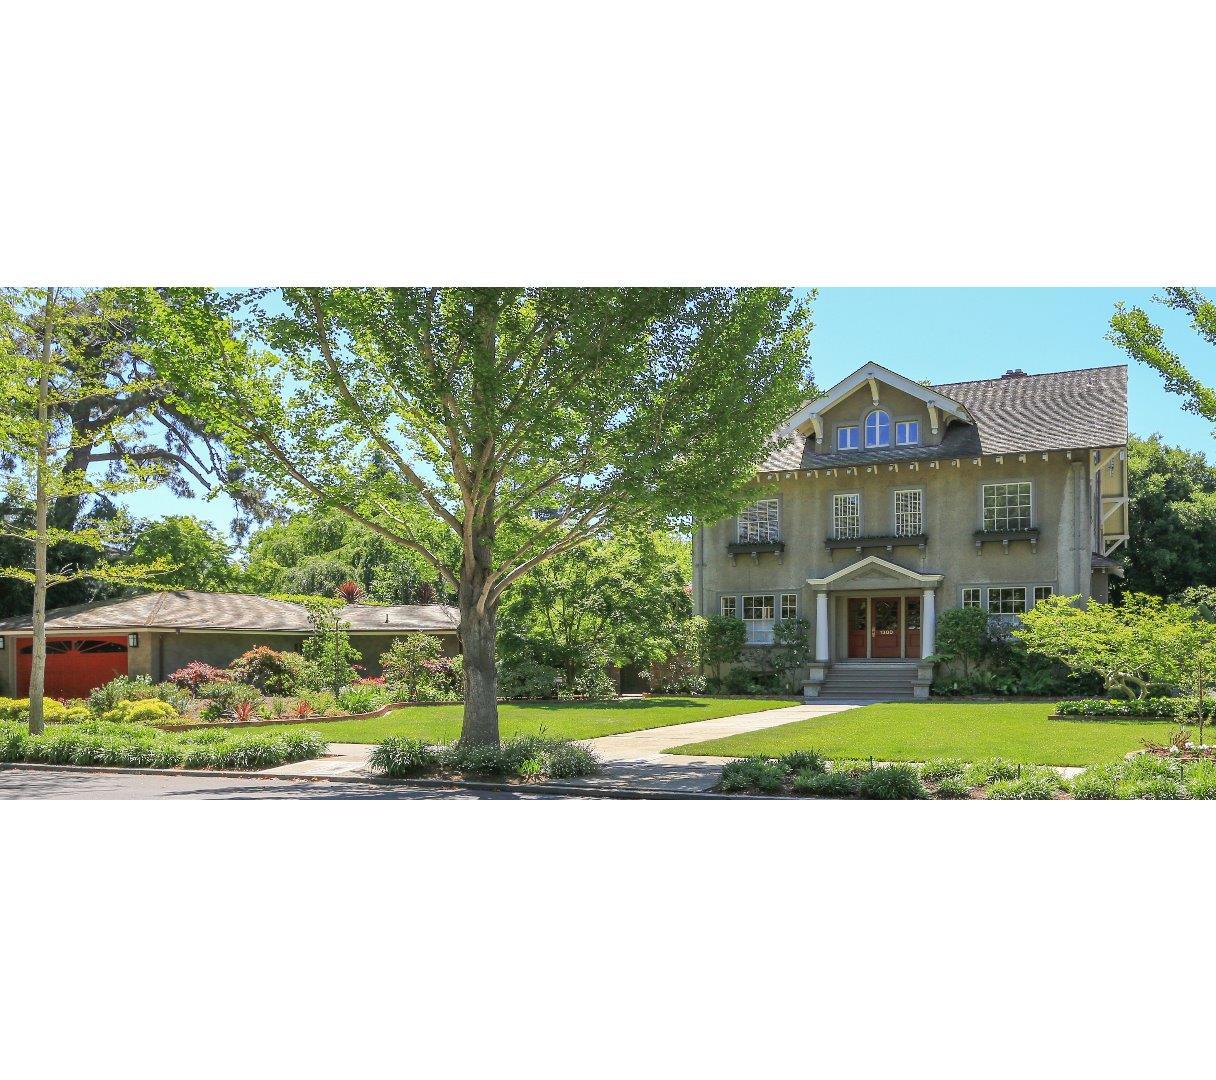 Single Family Home for Sale at 1300 Hamilton Avenue Palo Alto, California 94301 United States